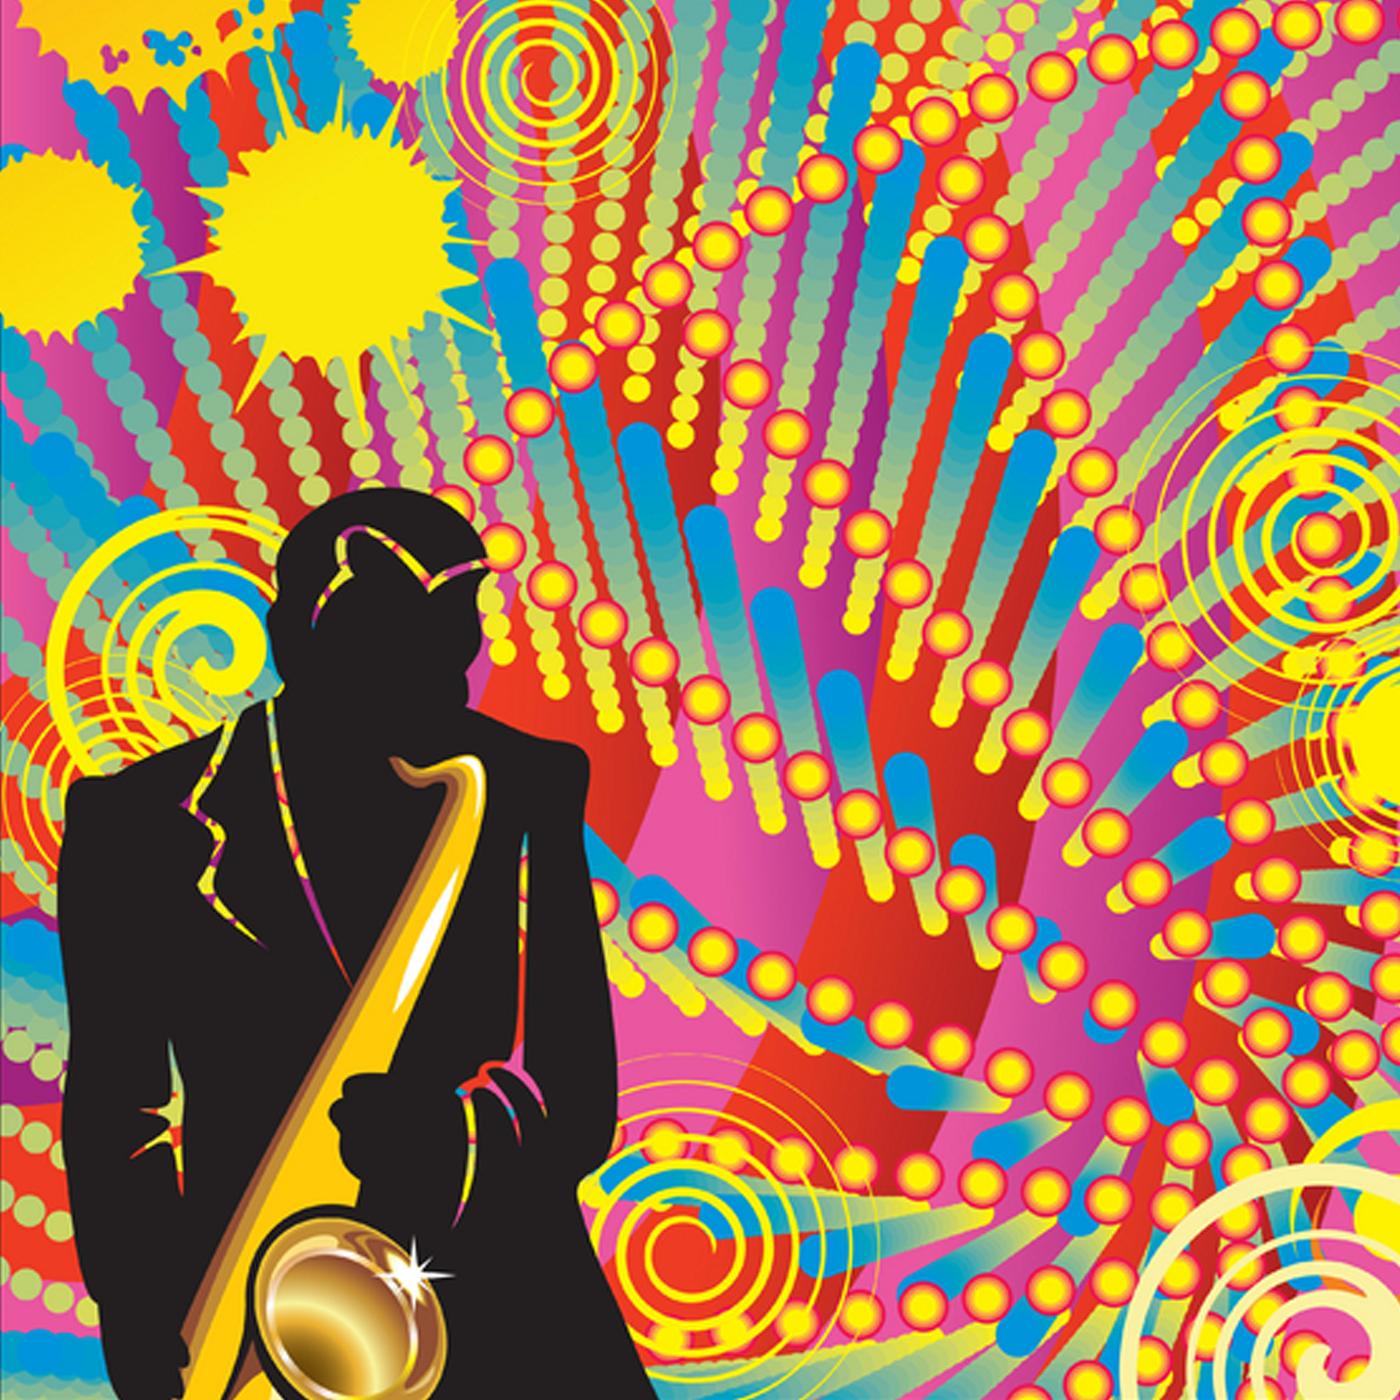 smooth jazz 24 7 on radiotunes radiotunes enjoy amazing free